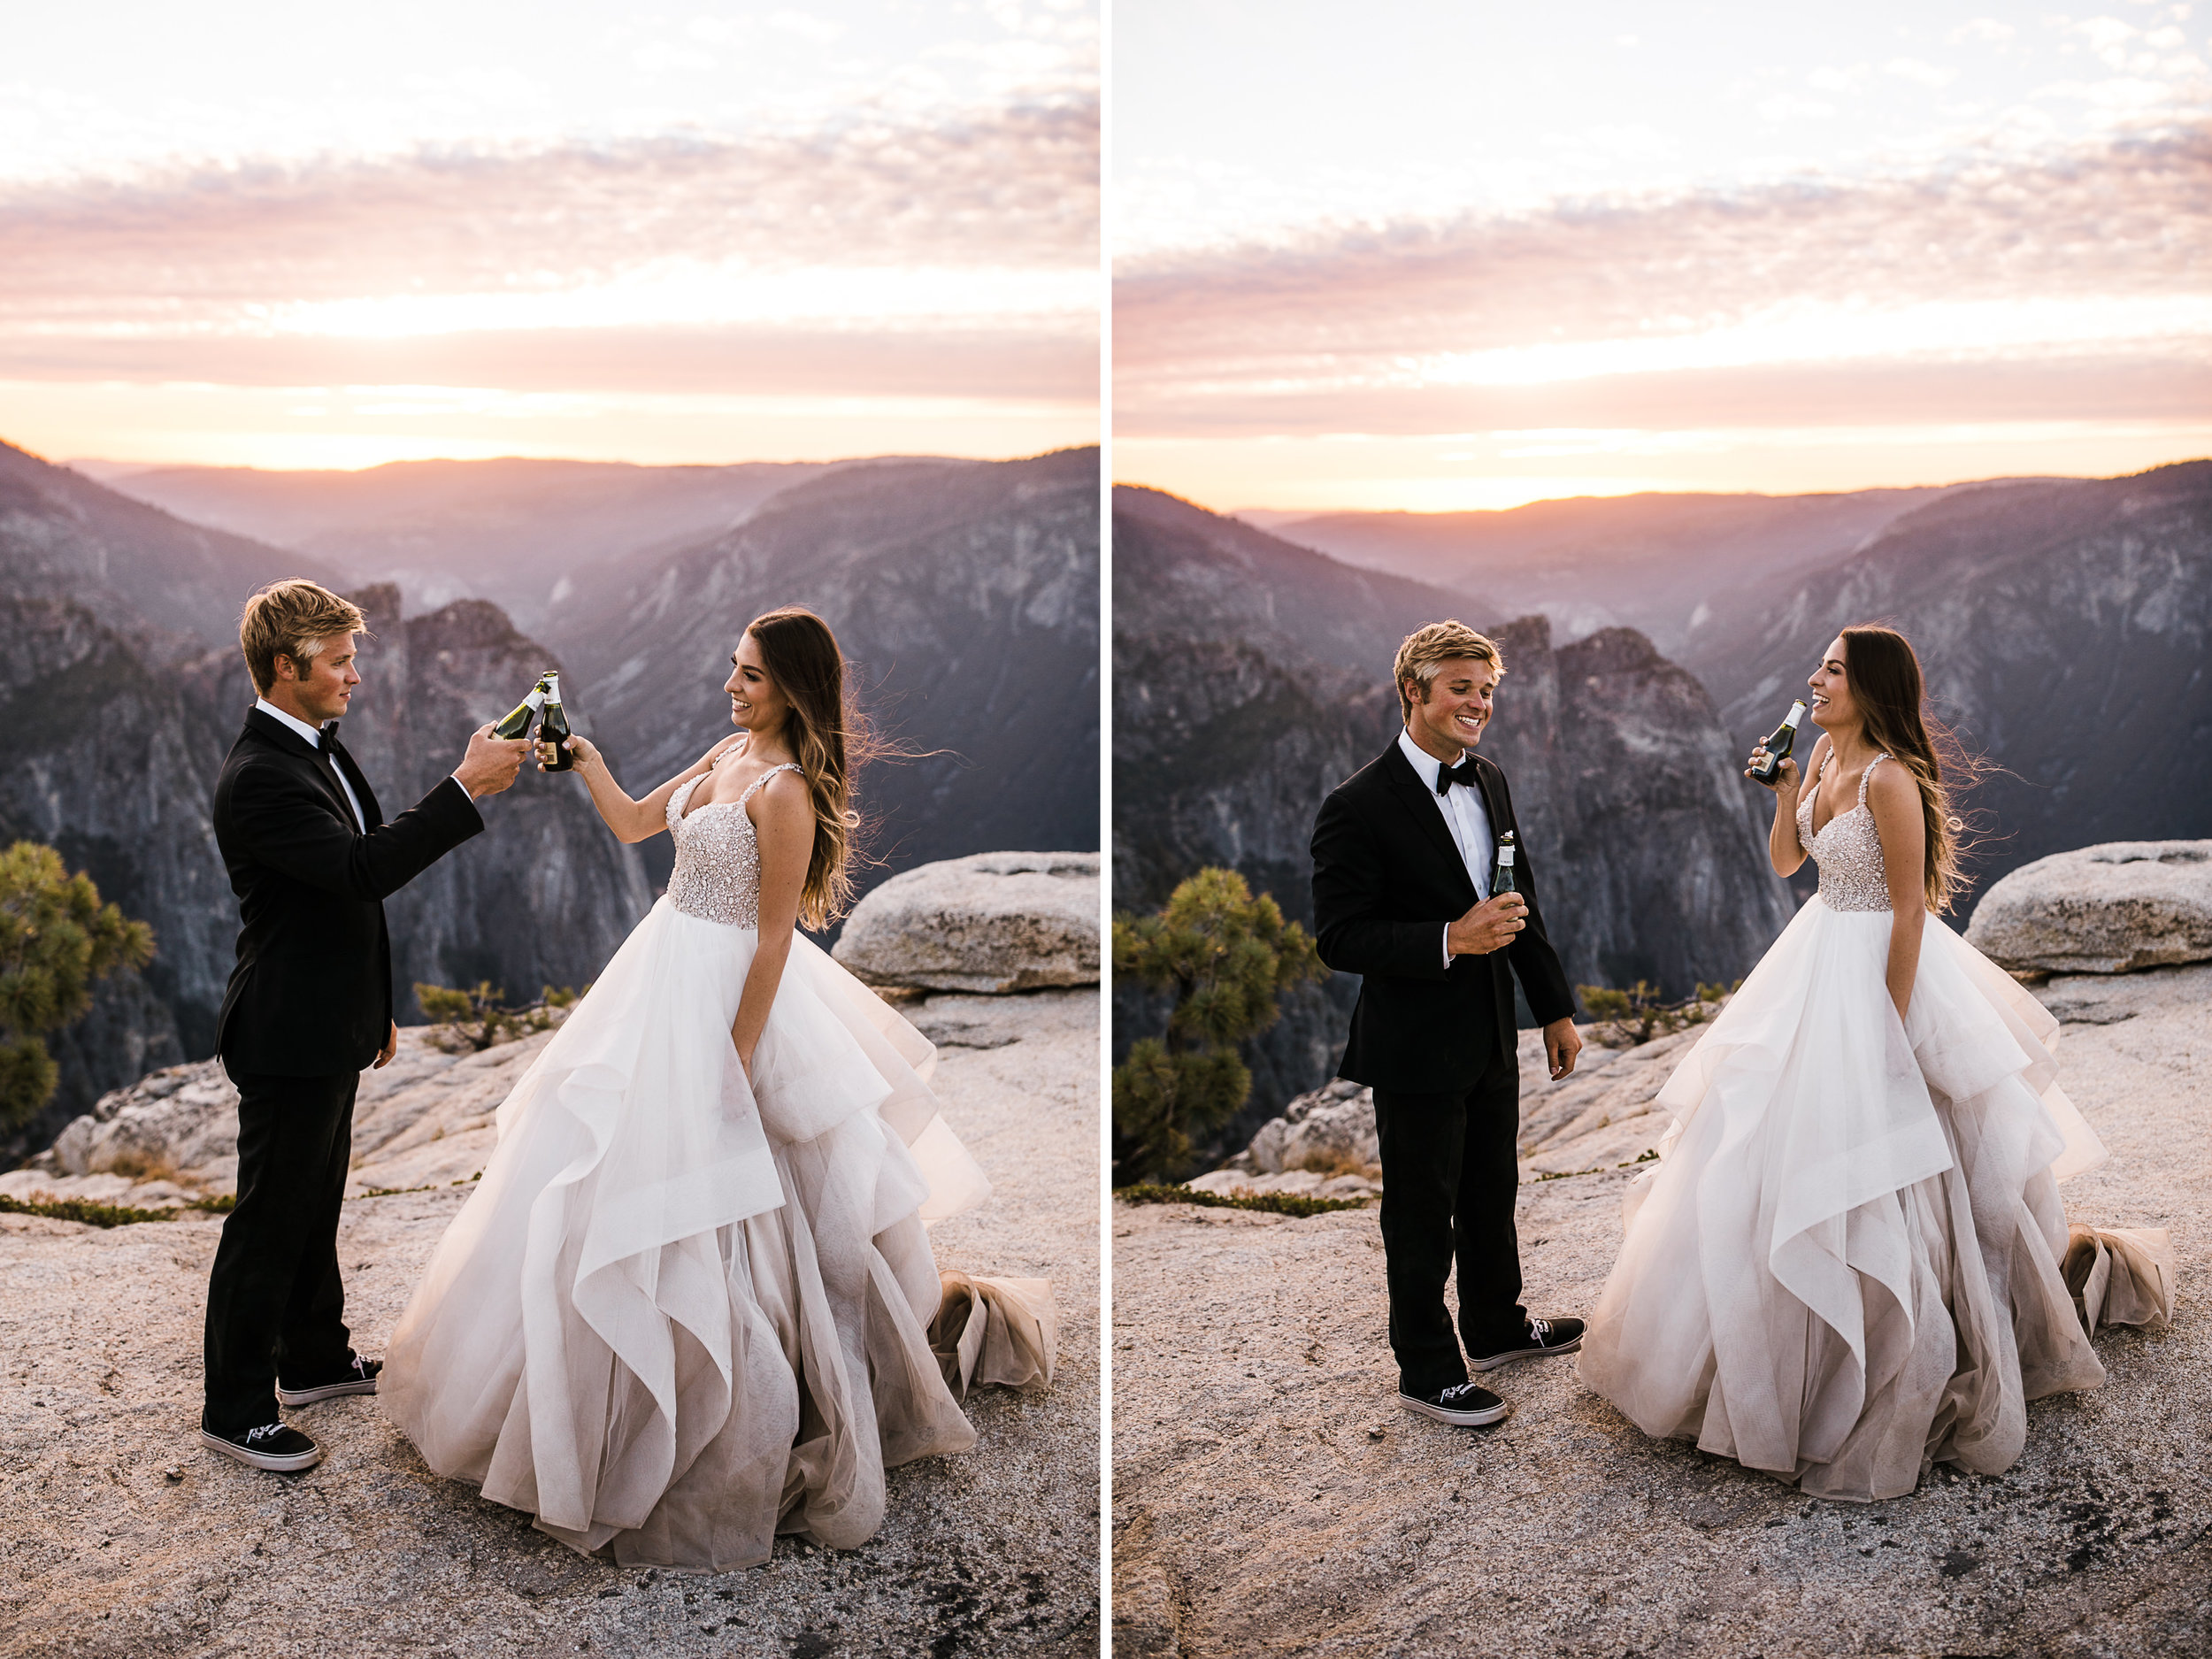 intimate wedding in yosemite national park | glacier point wedding ceremony | wedding portraits at taft point | hiking wedding inspiration | adventure elopement photographer | the hearnes